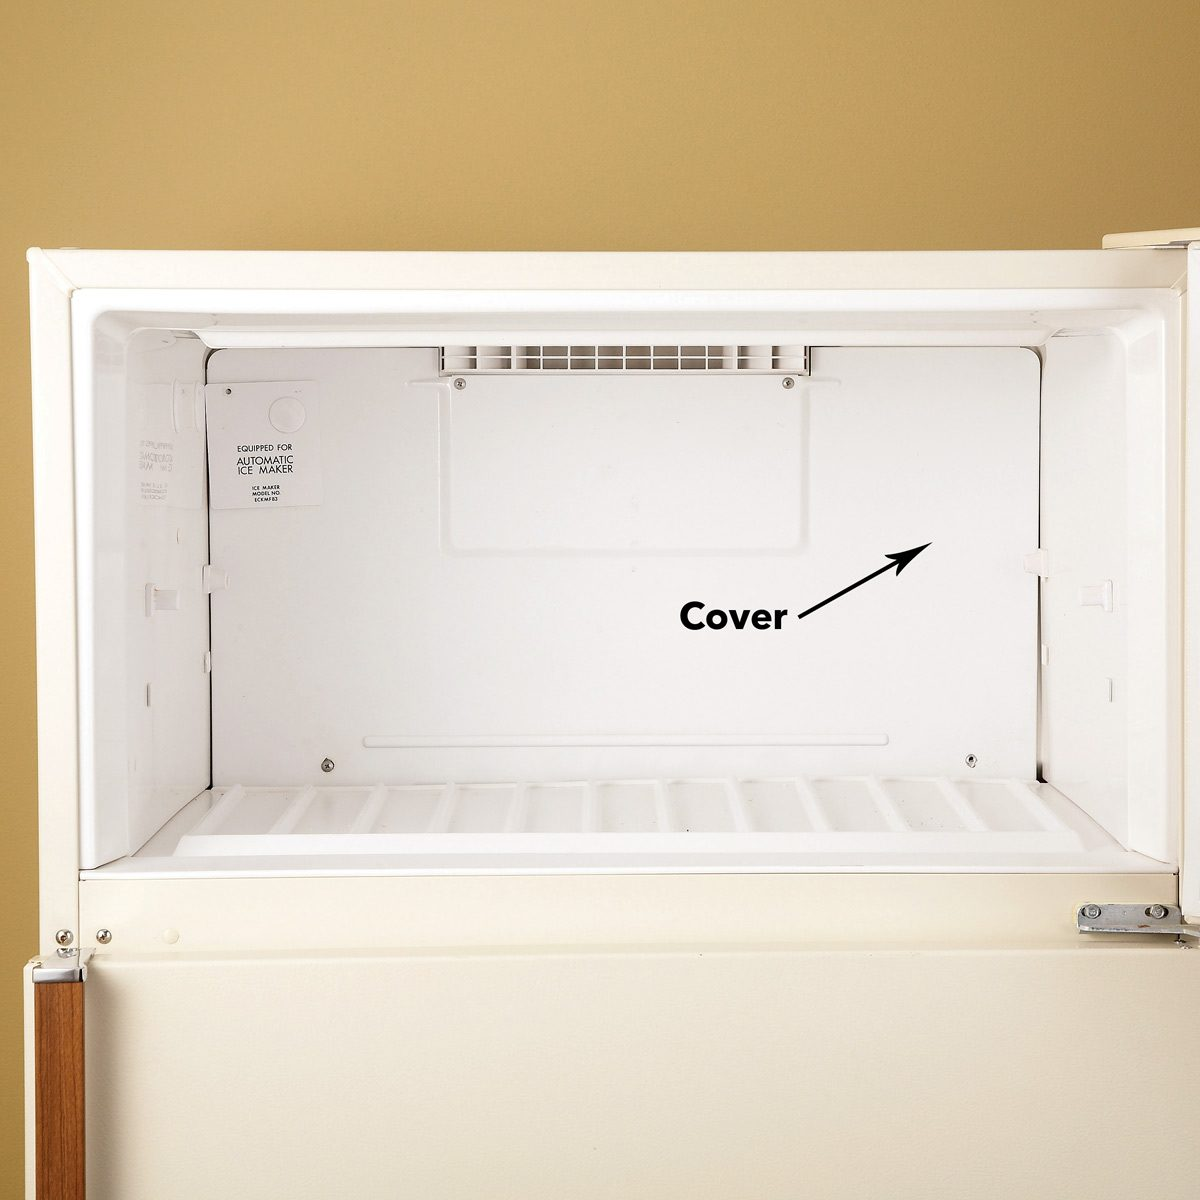 fix refrigerator